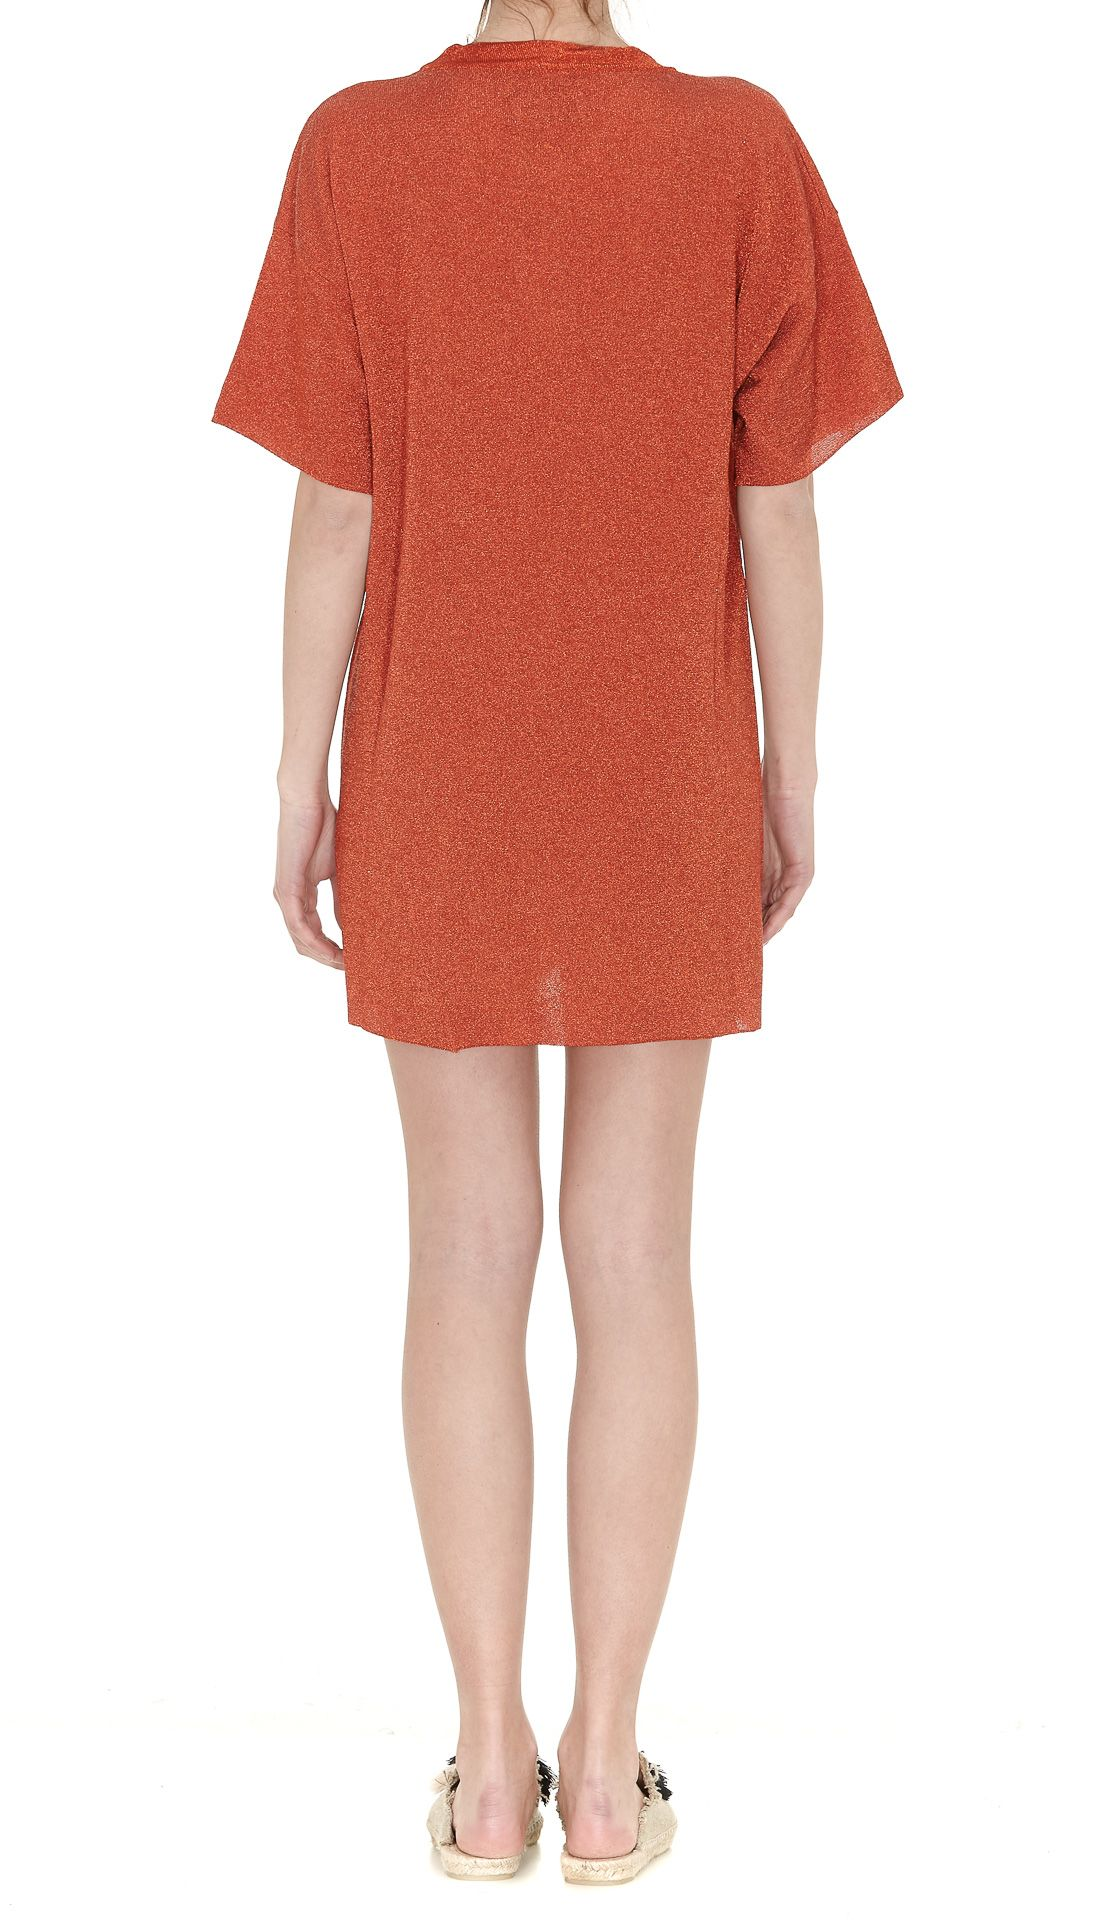 V-neck knit dress - Metallic Laneus eLCGz